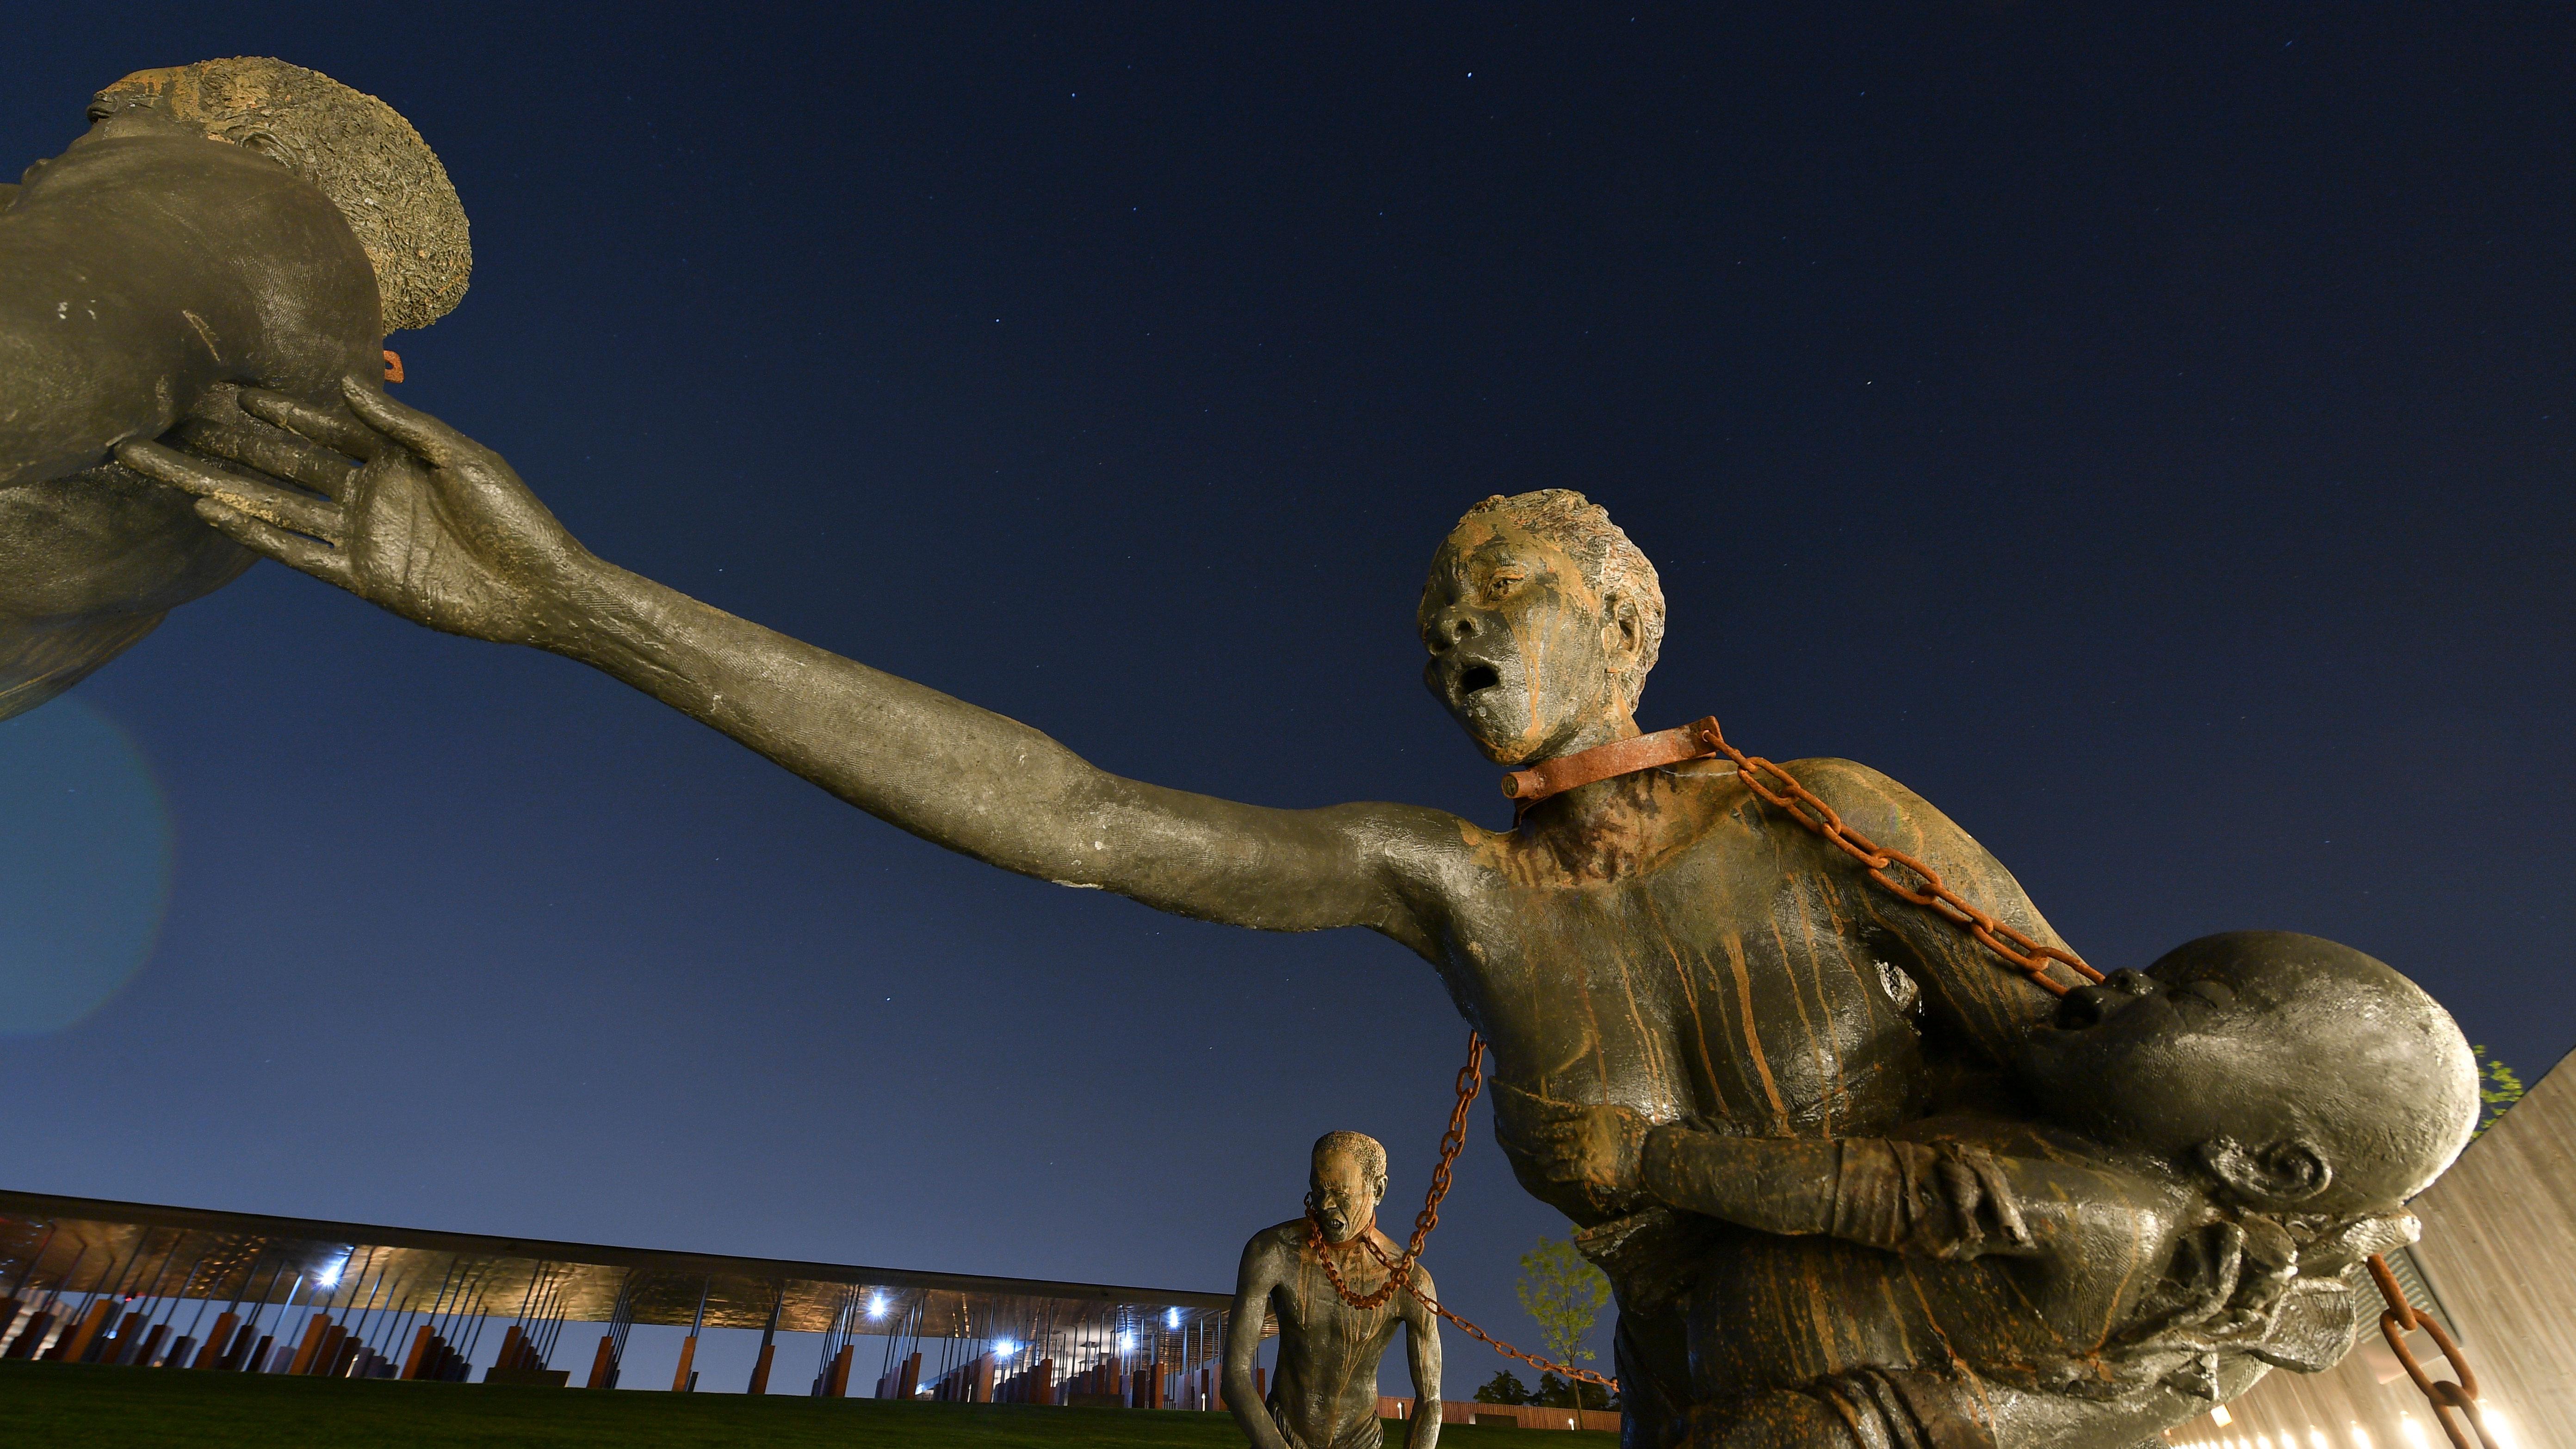 MONTGOMERY, AL – APRIL 20: A sculpture by artist Kwame Akoto-Ba